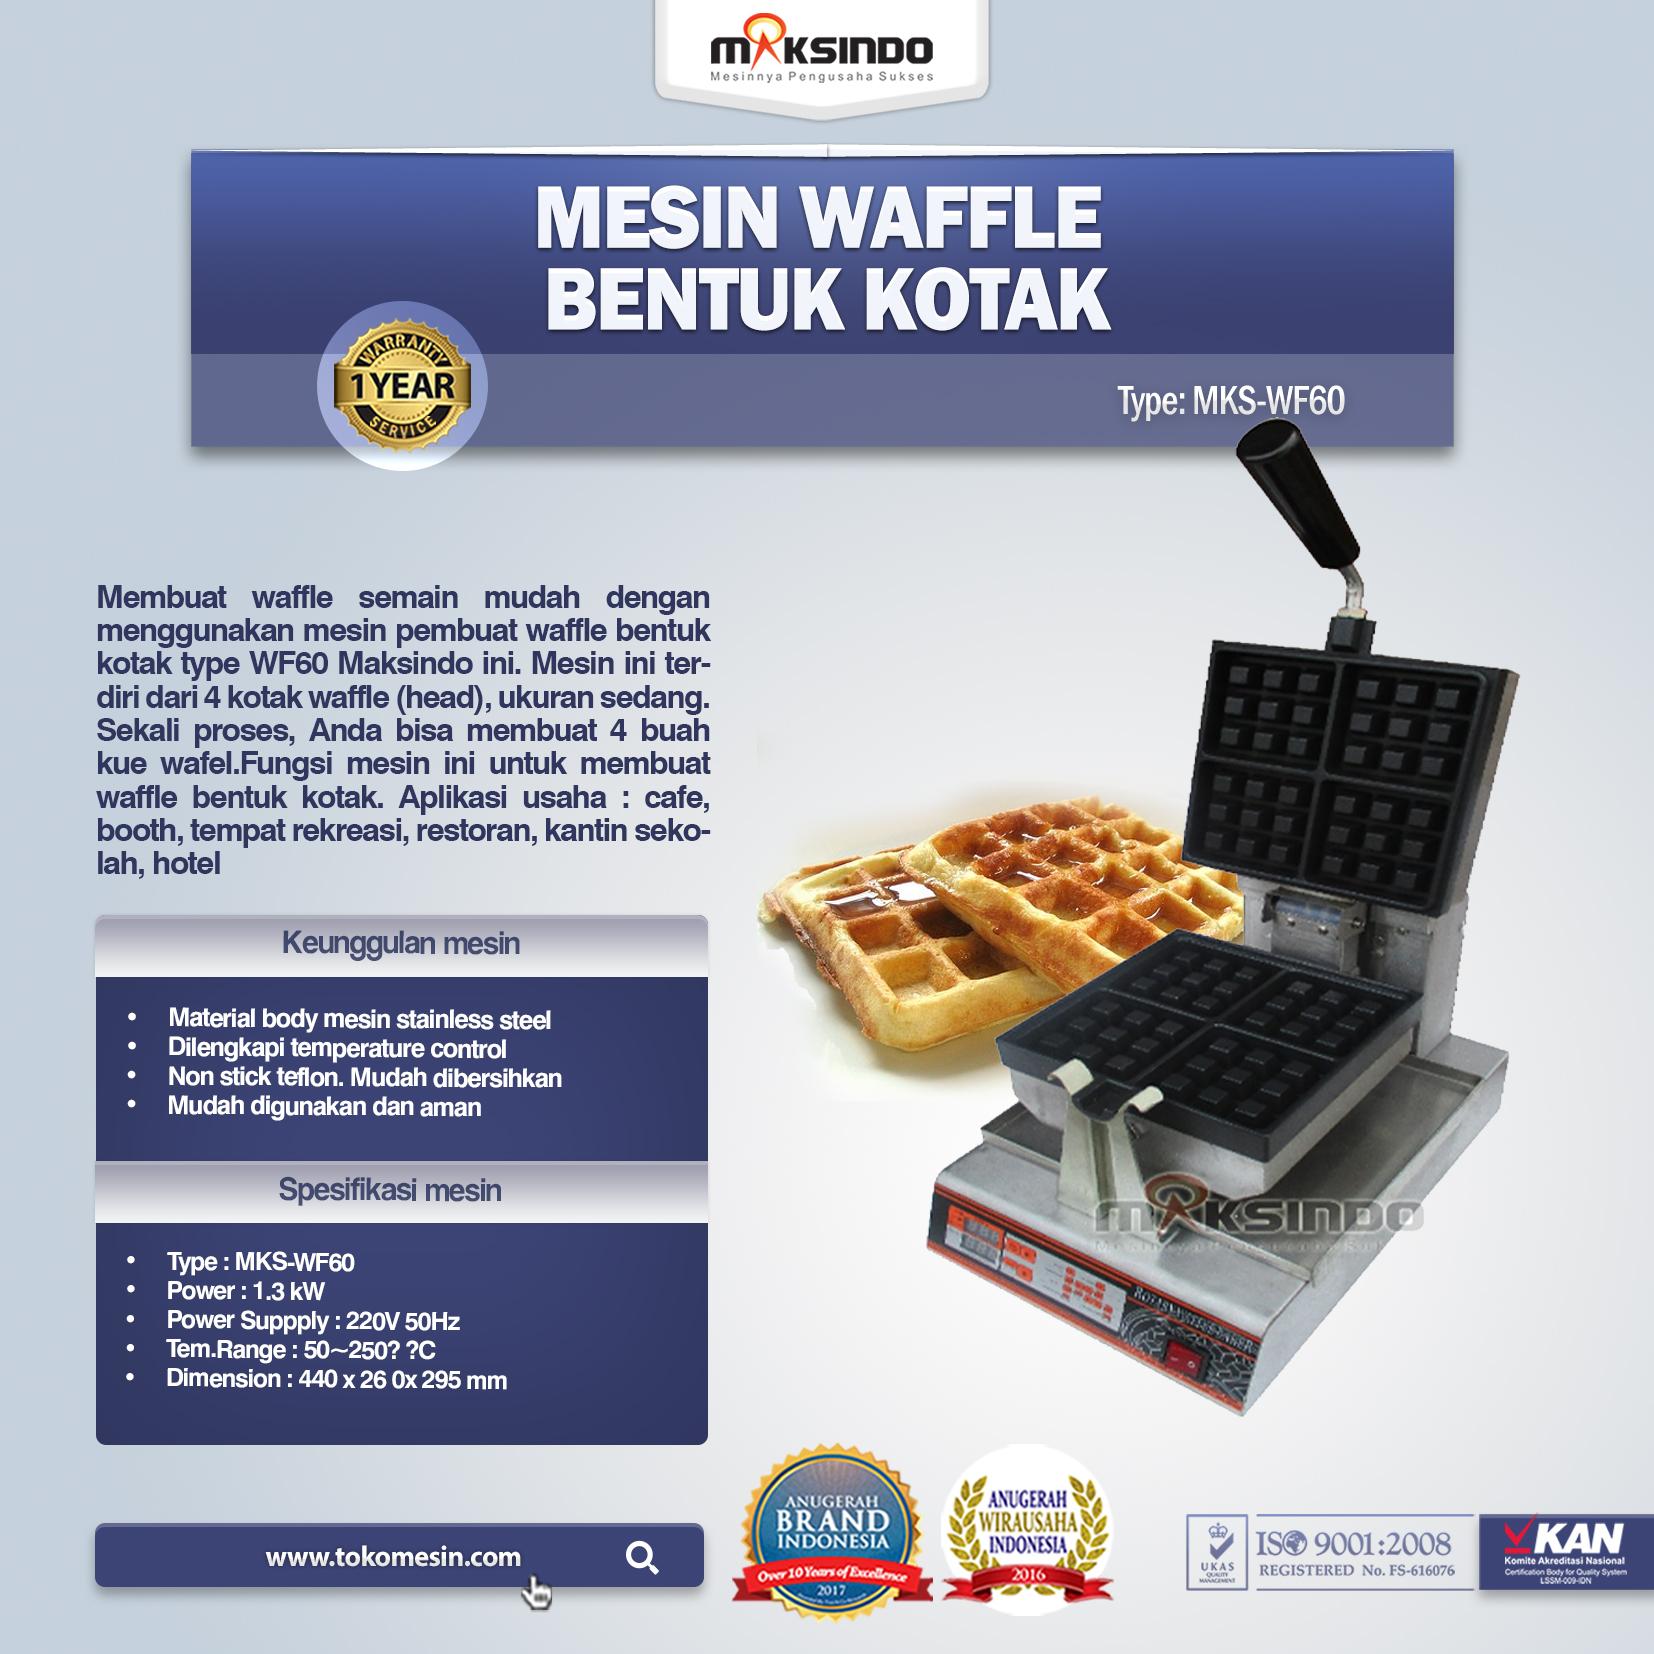 Mesin Waffle Bentuk Kotak (WF-60)